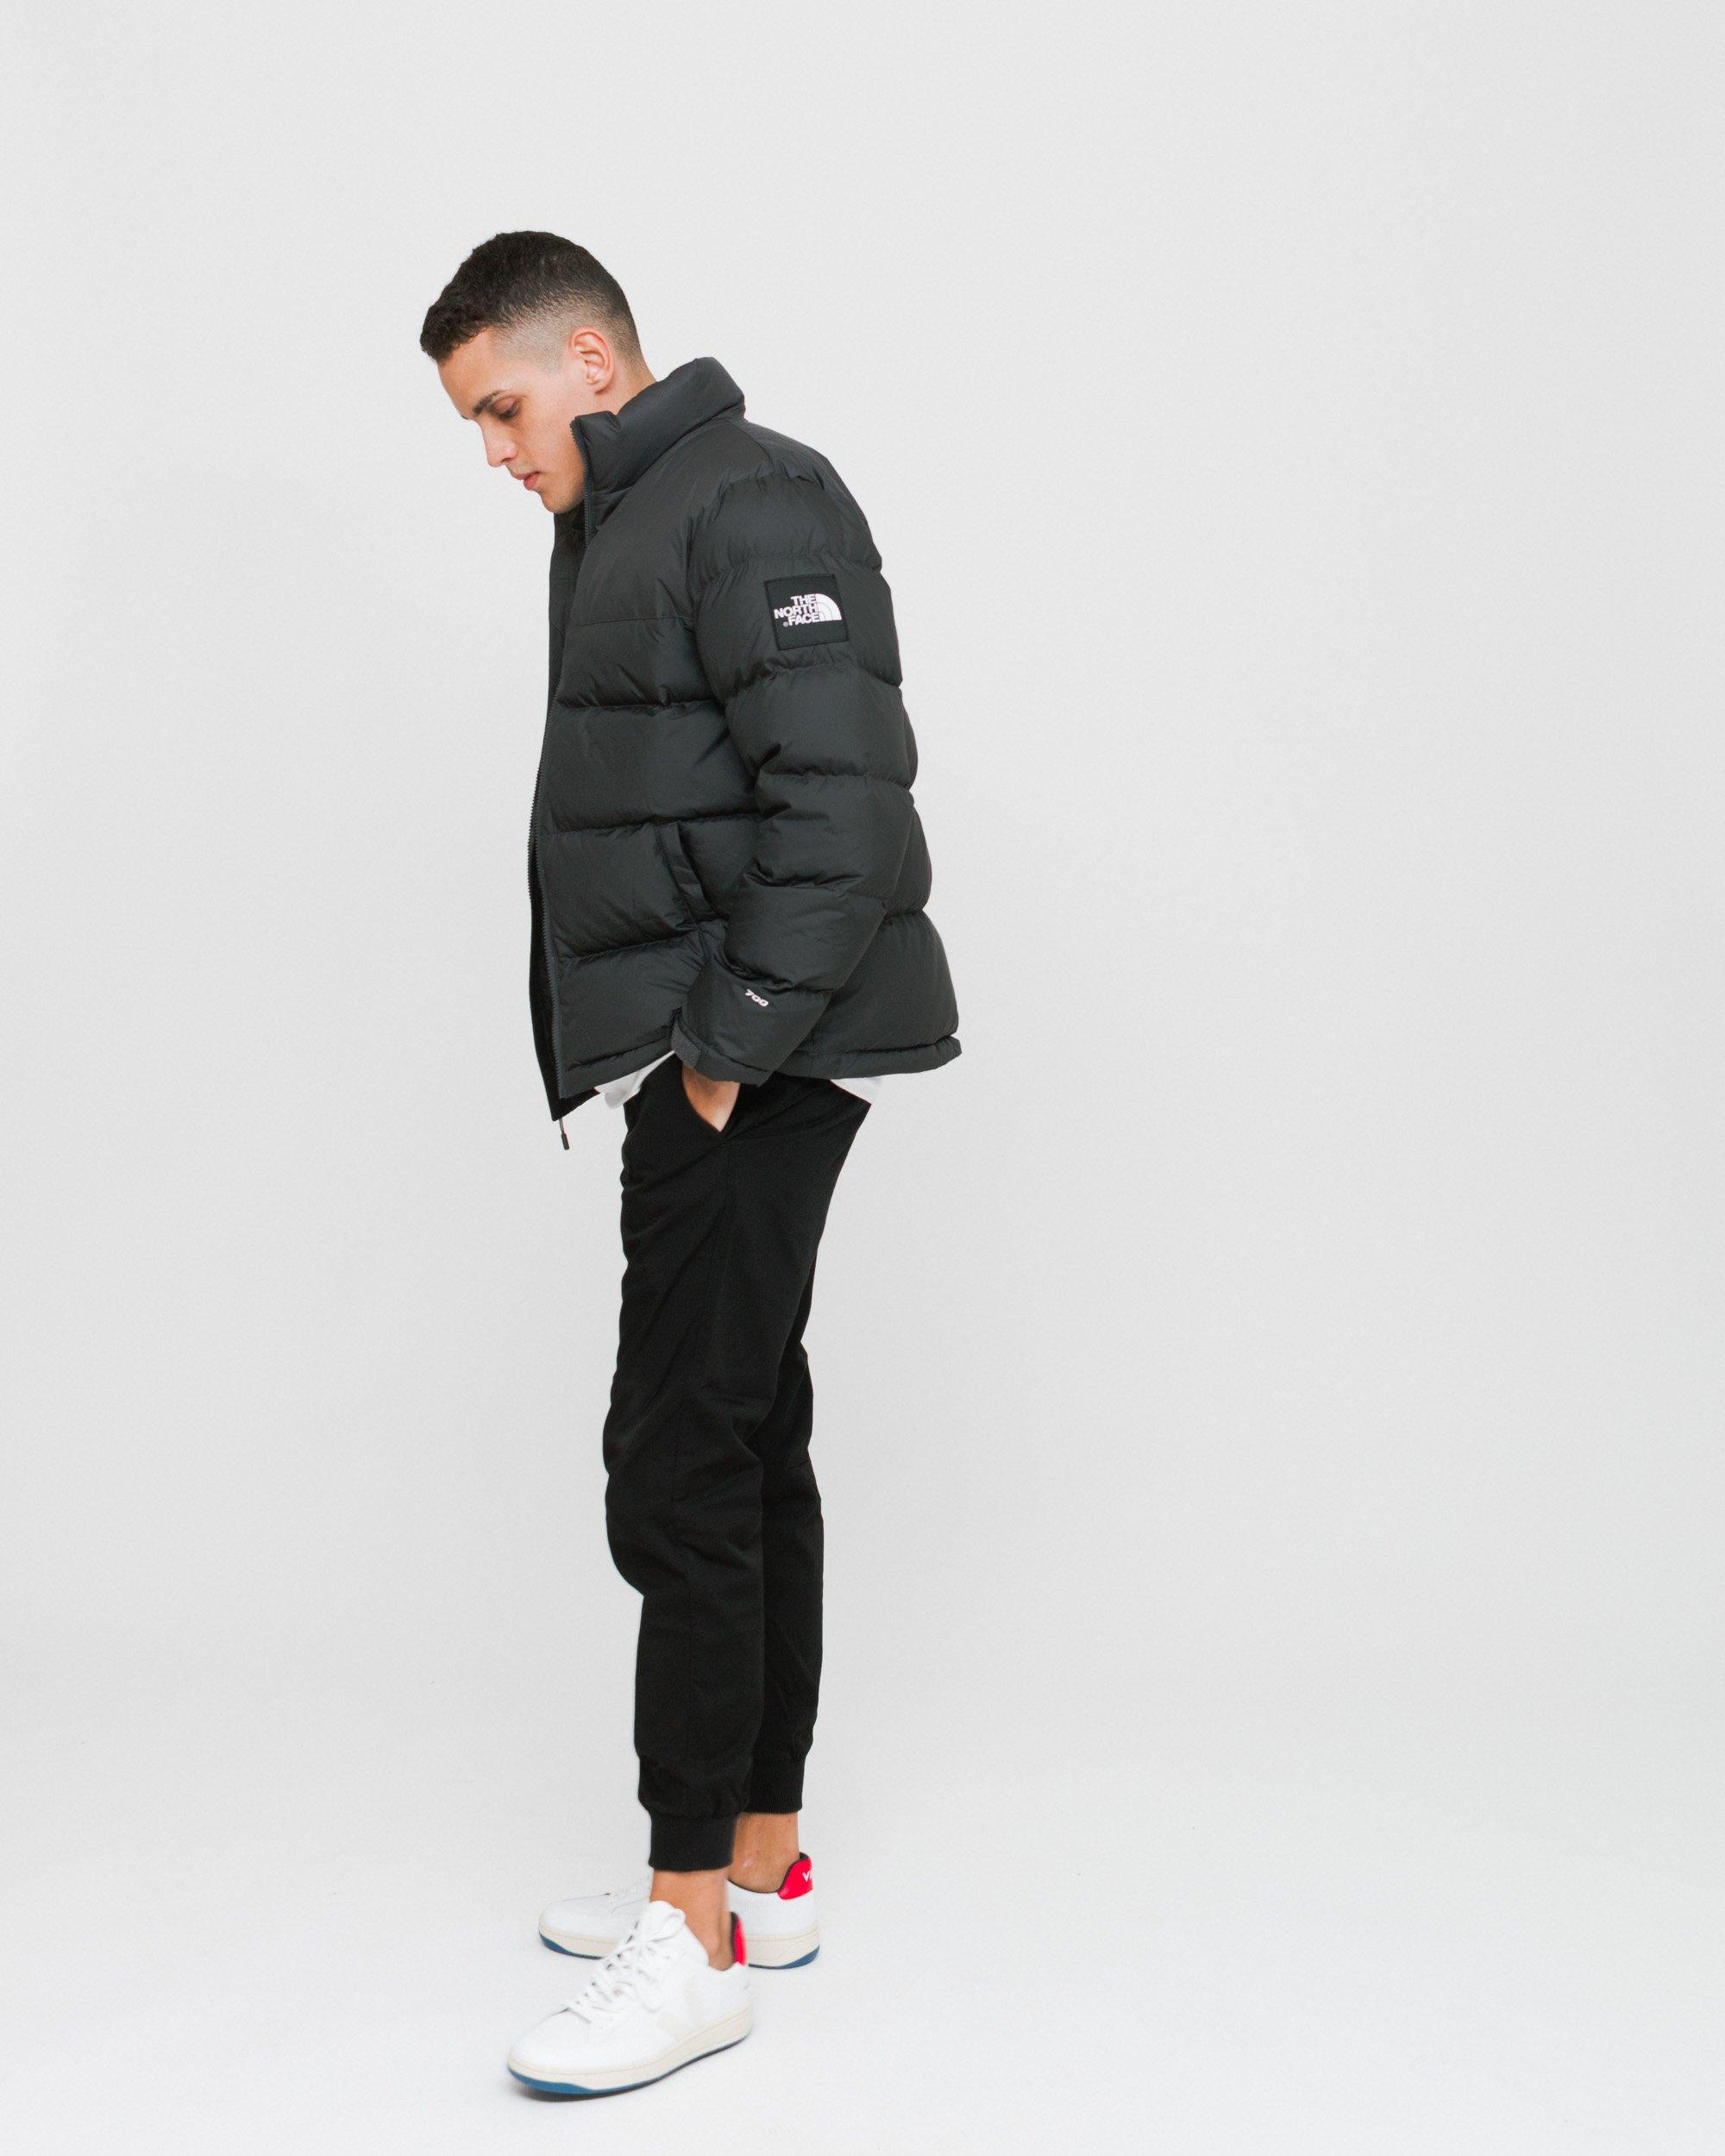 ad288390f The North Face 1992 Nuptse Jacket - Asphalt Grey